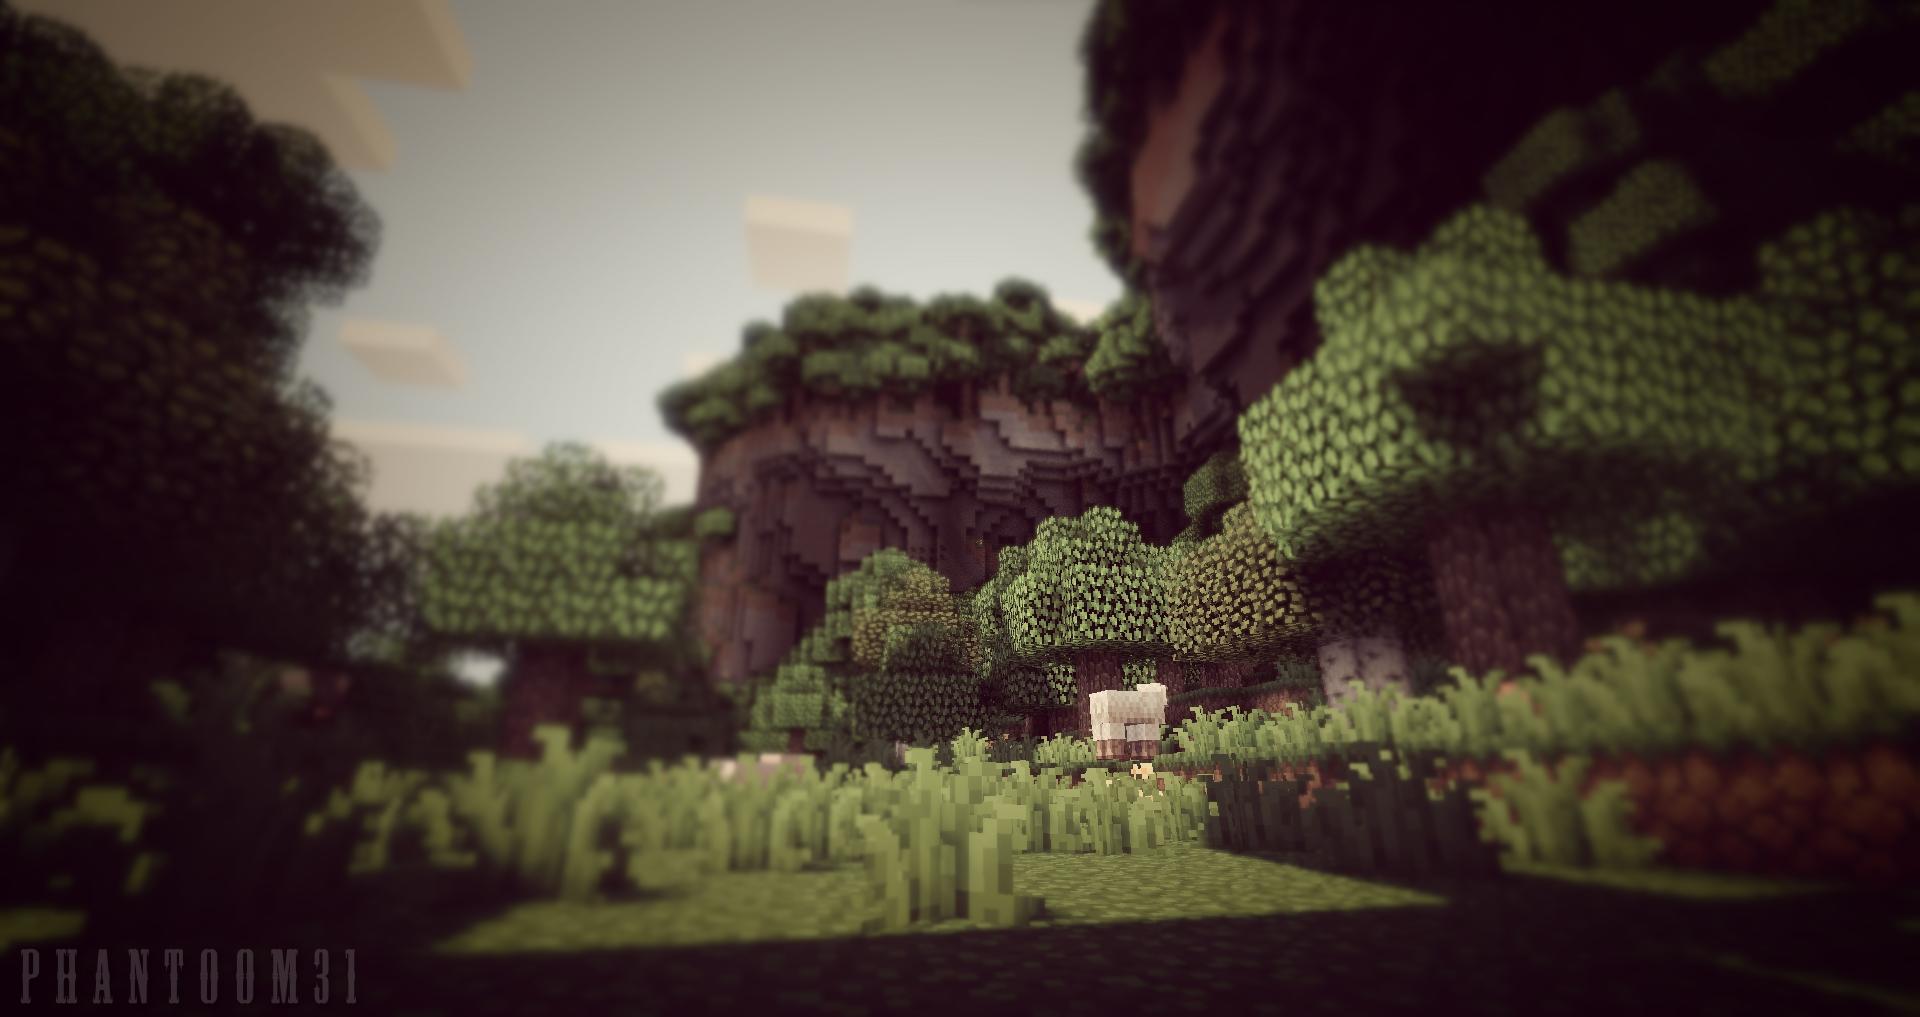 Galerie Hd Les Merveilles De Minecraft Minecraftfr Forum